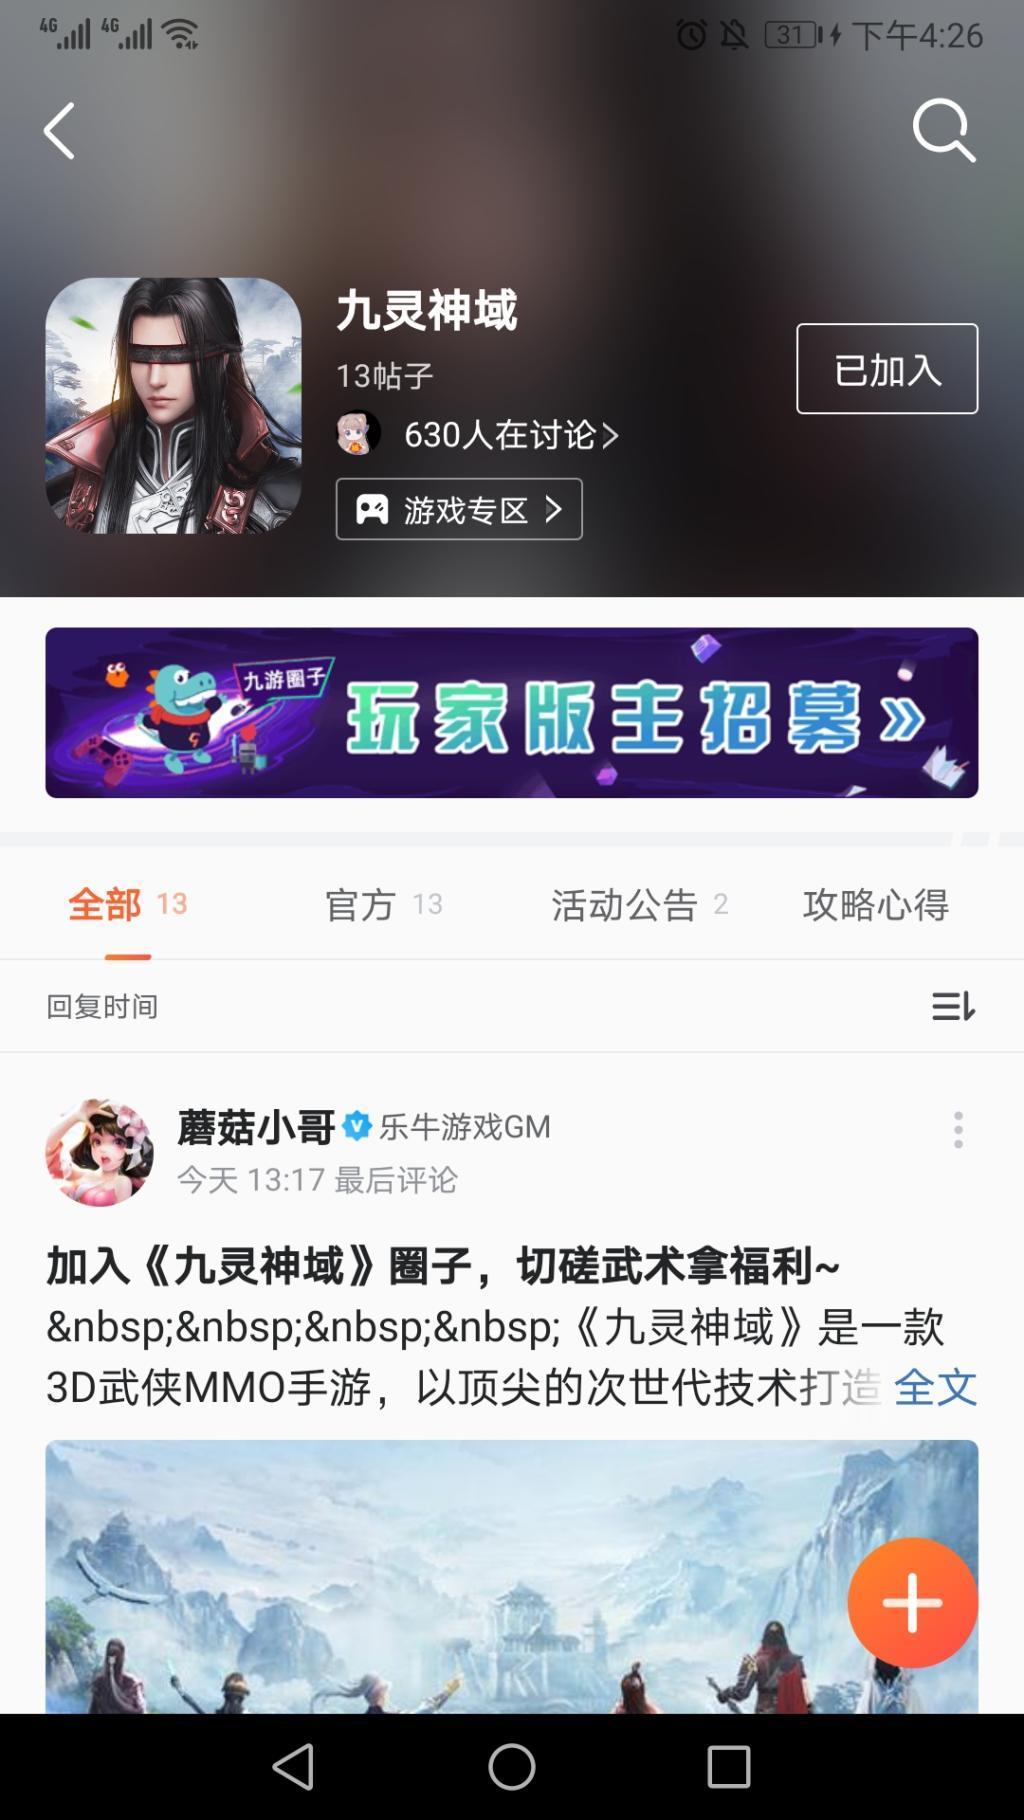 Screenshot_20200329_162615_cn.ninegame.gamemanage.jpg